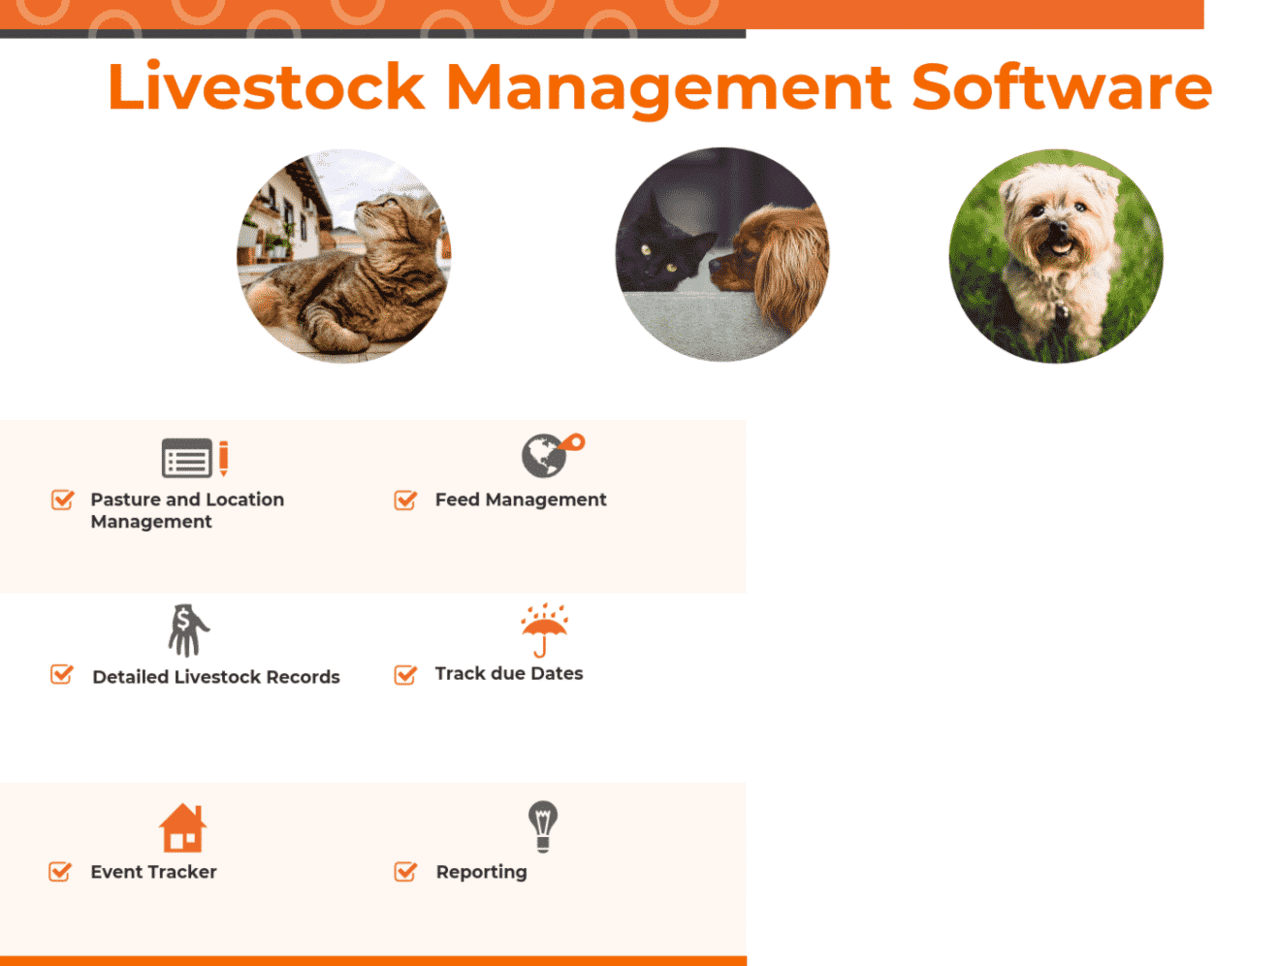 Top 8 Livestock Management Software In